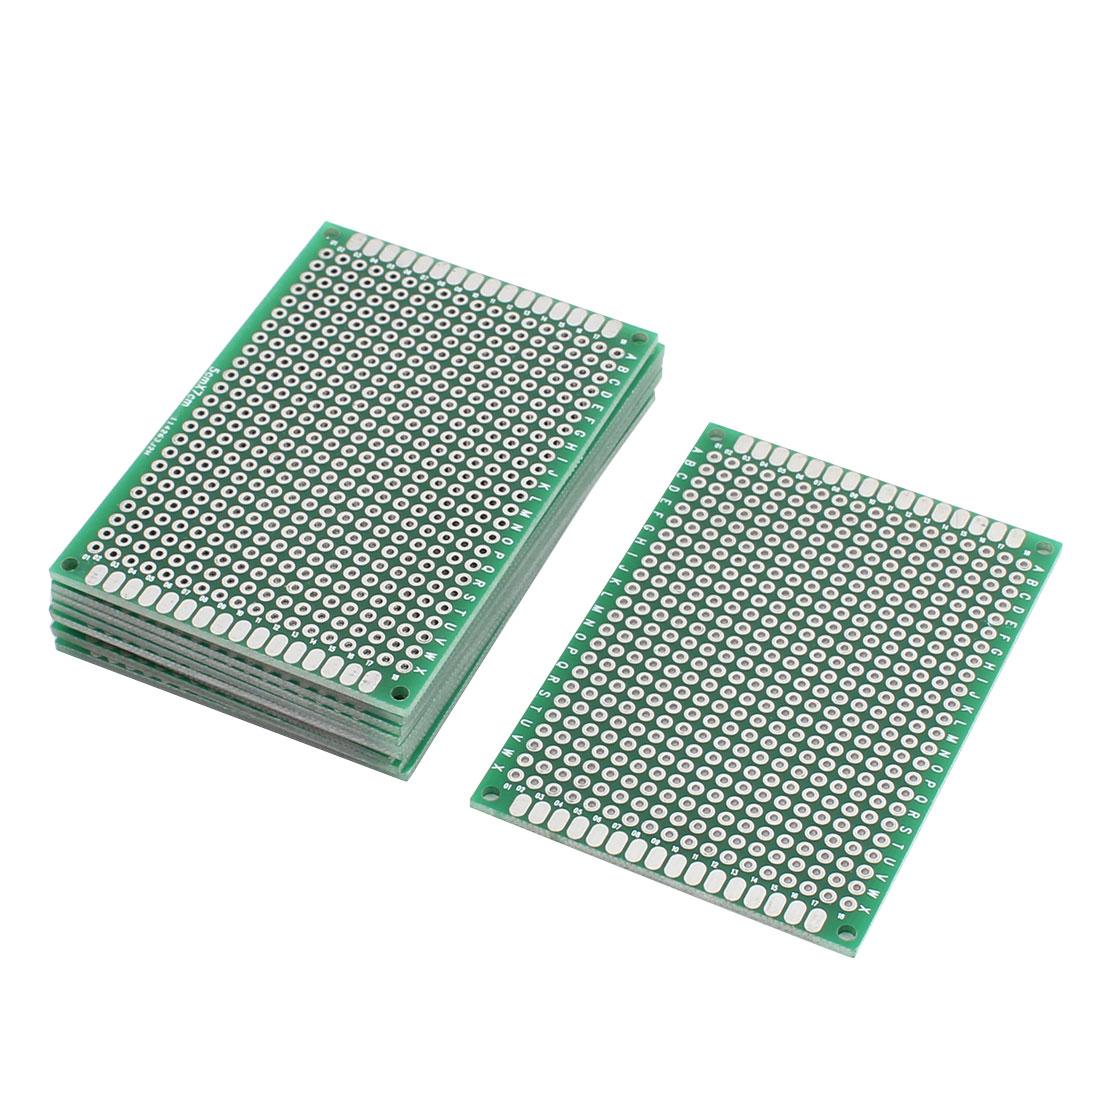 10Pcs Double-Side Prototype Solderable Paper Universal PCB Board 5cmx7cm